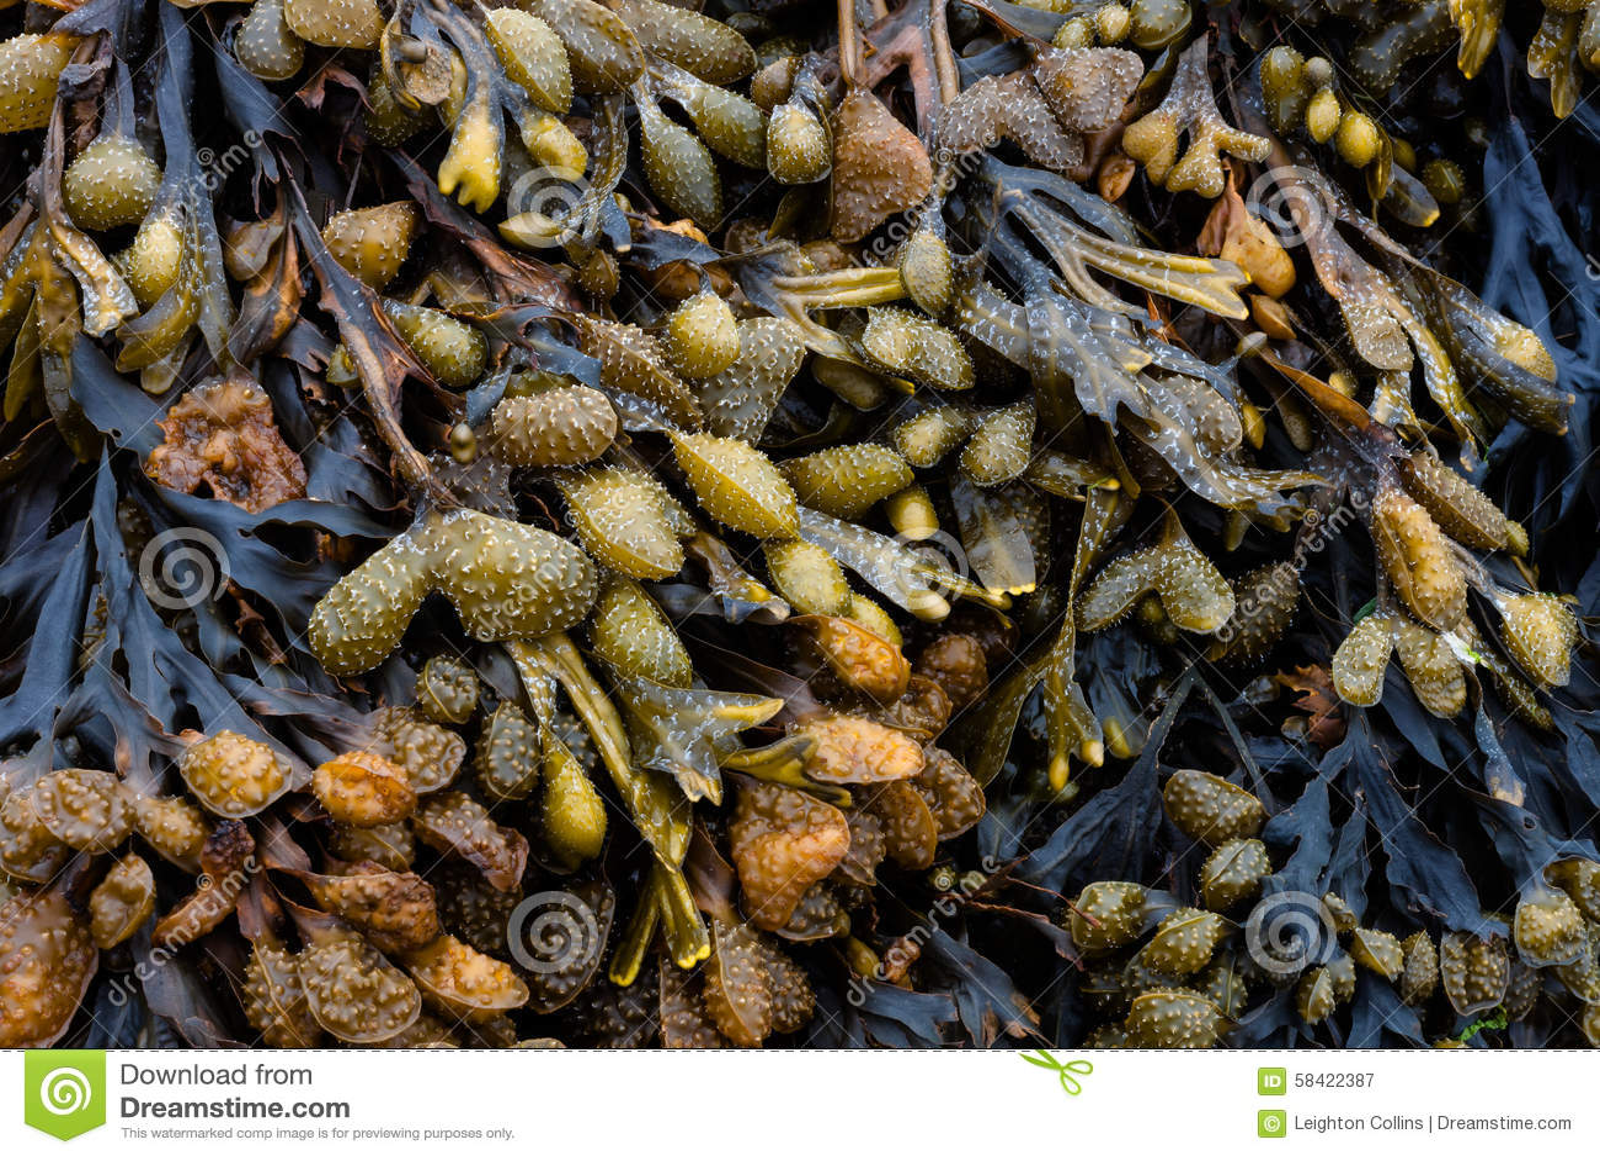 Bladderwrack algae